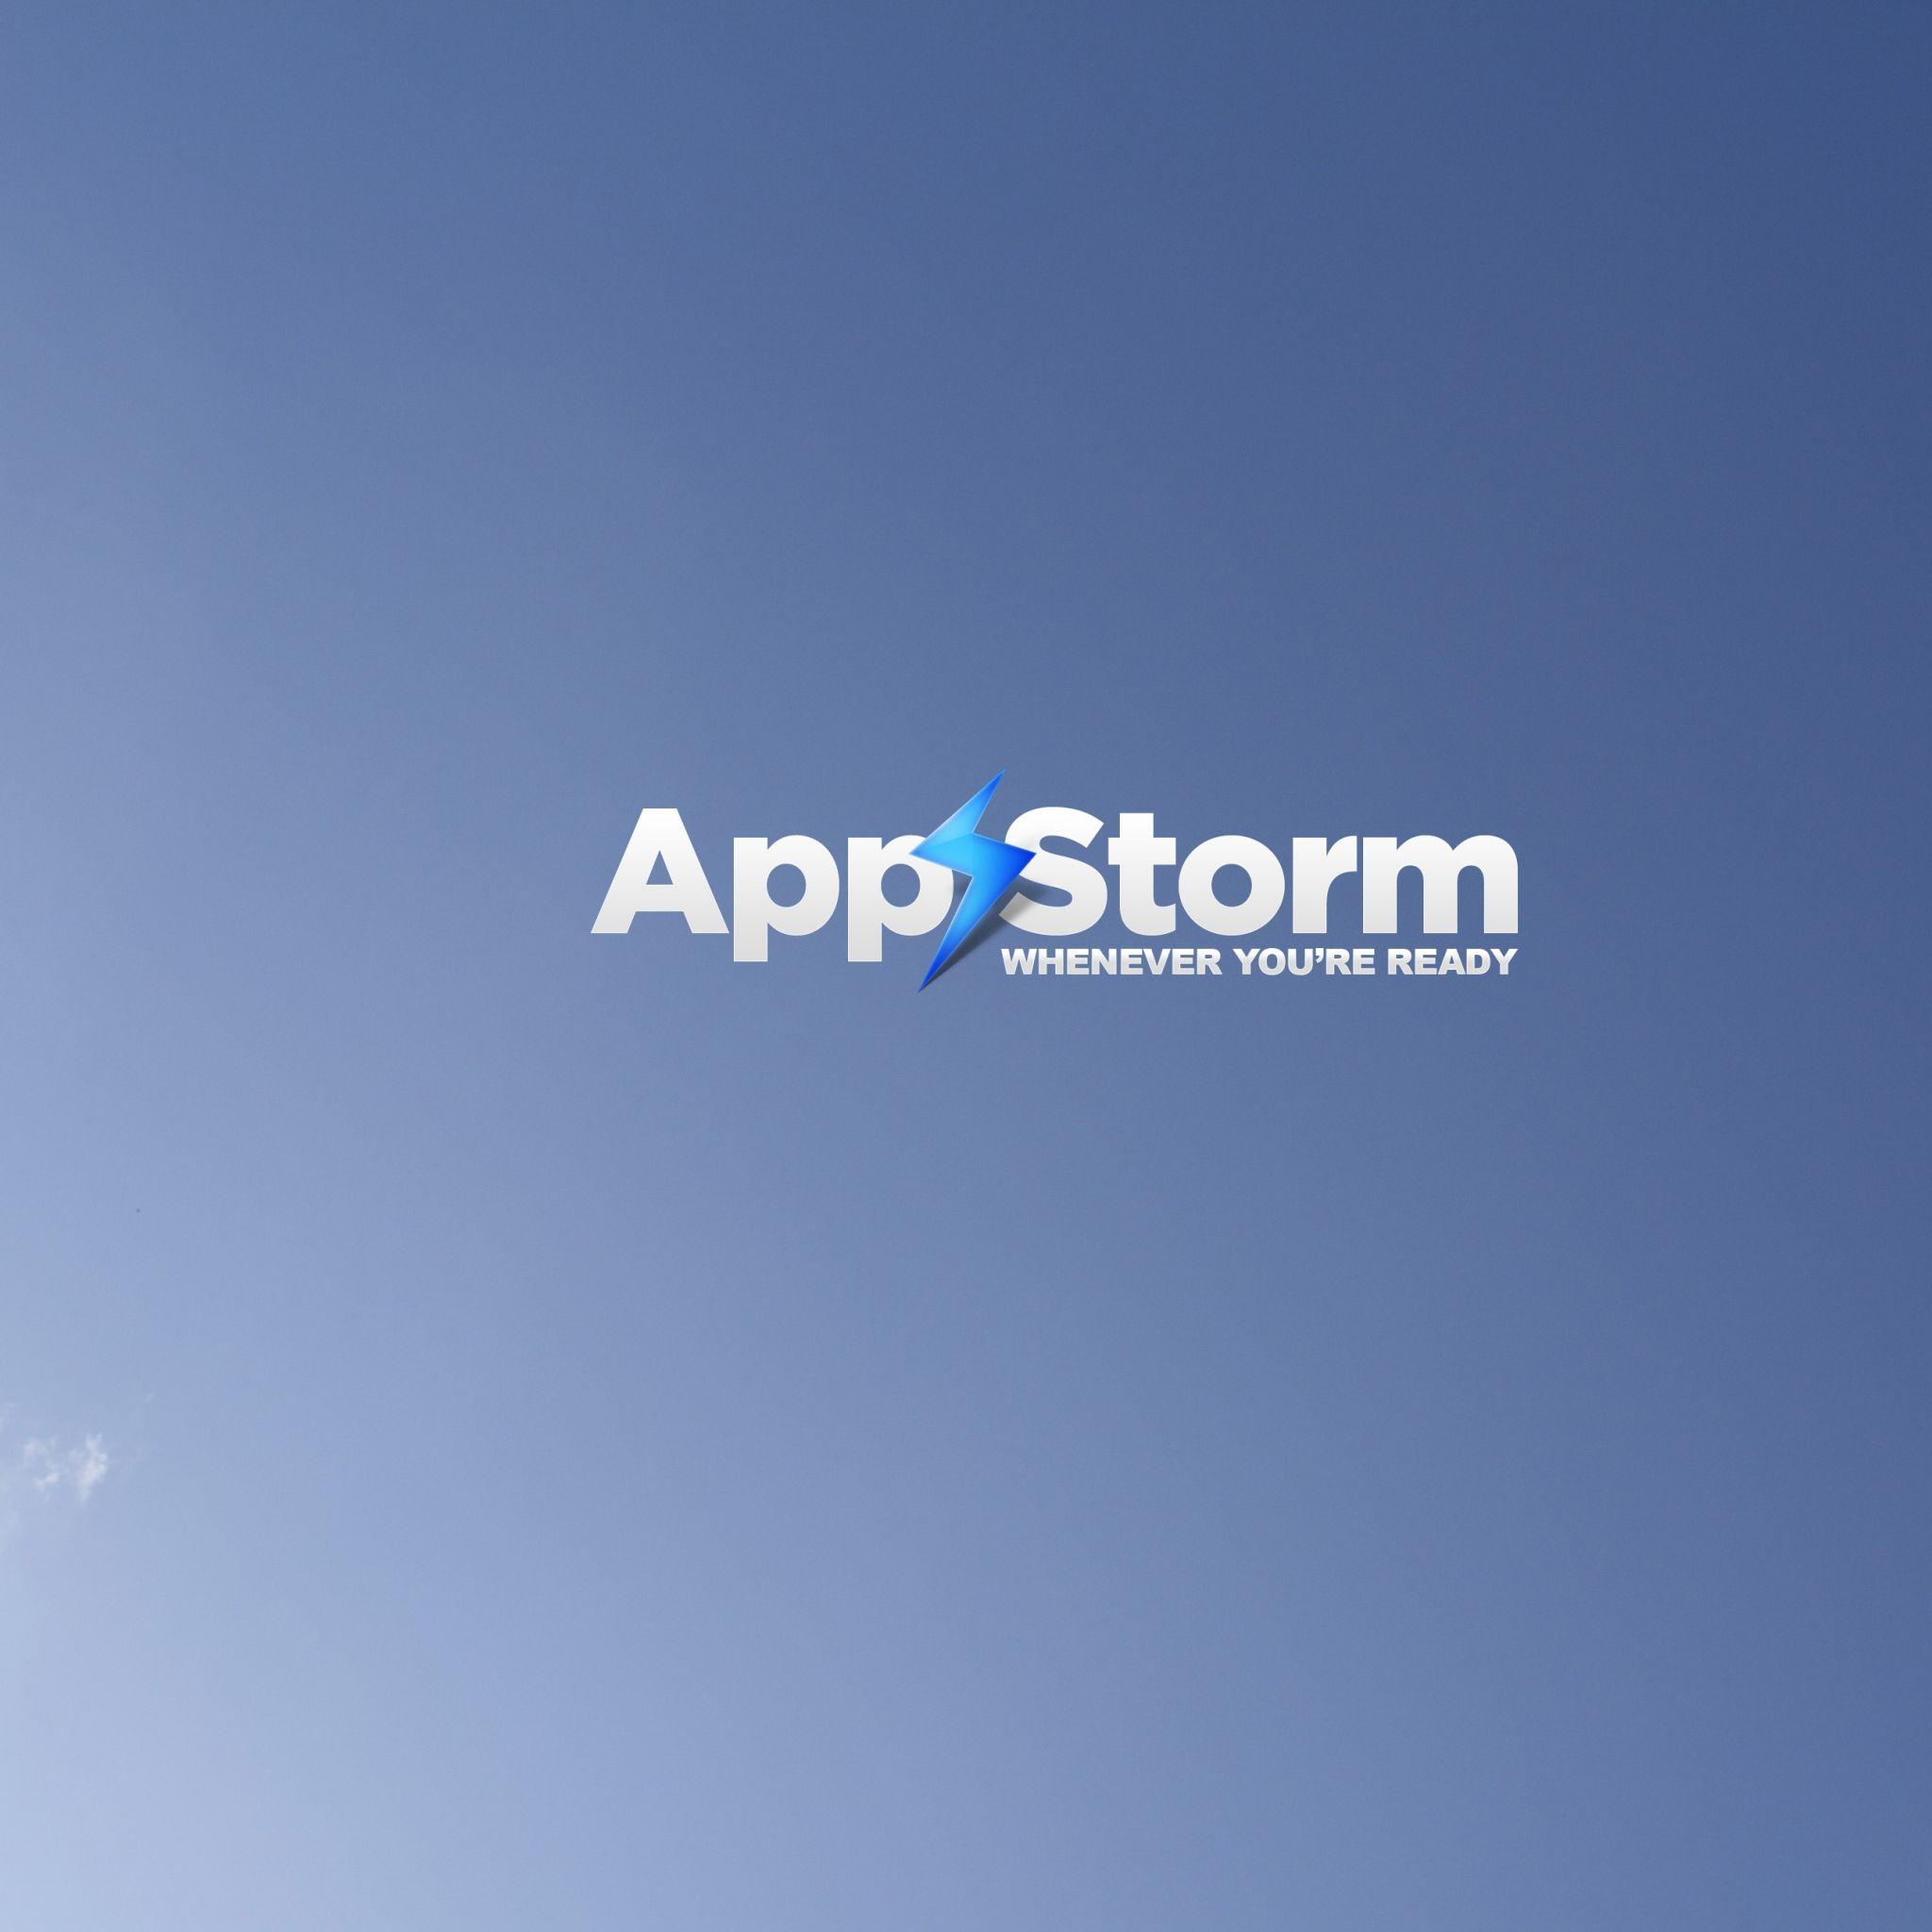 2048x2048 wallpaper app storm, apple, mac, sky, blue, white | apple